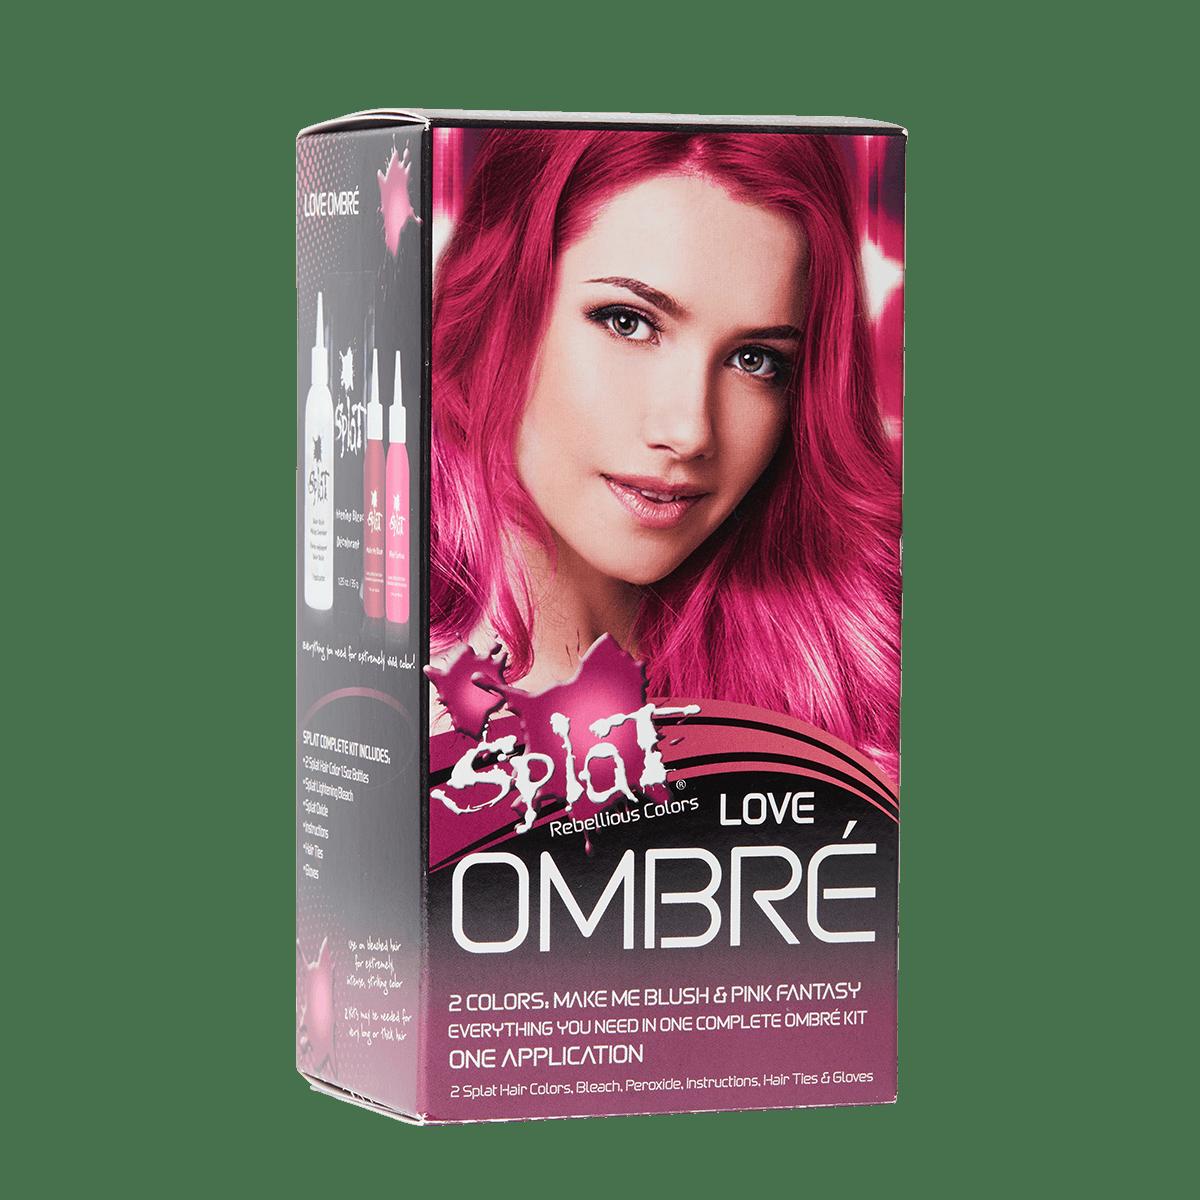 Splat Ombre Complete Kit Ombre Love Pink Semi Permanent Hair Dye